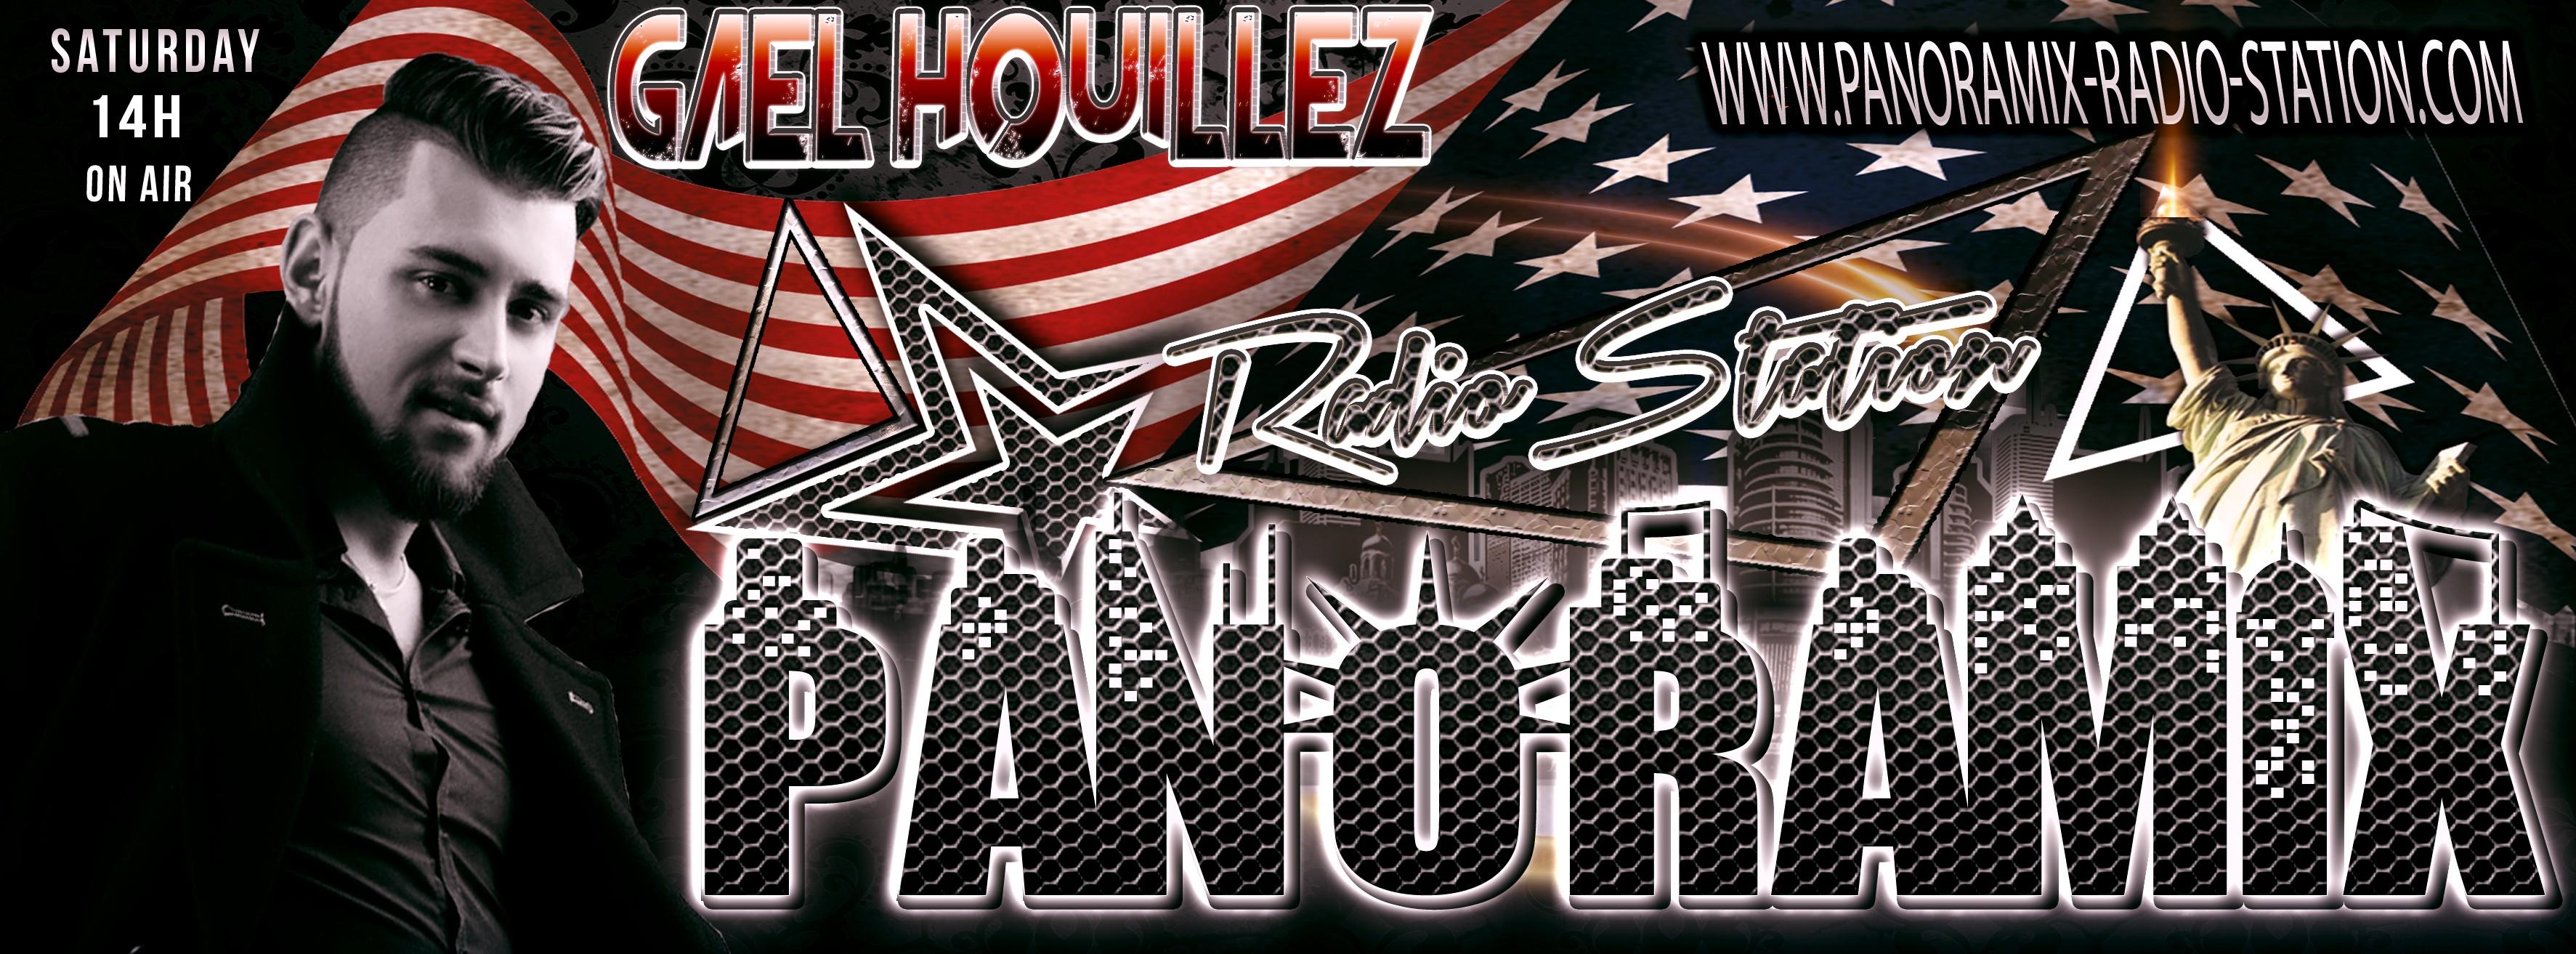 http://panoramix-radio-station.com/wp-content/uploads/2016/12/Gael-houillez-USA-bannier-2017-PANO.jpg